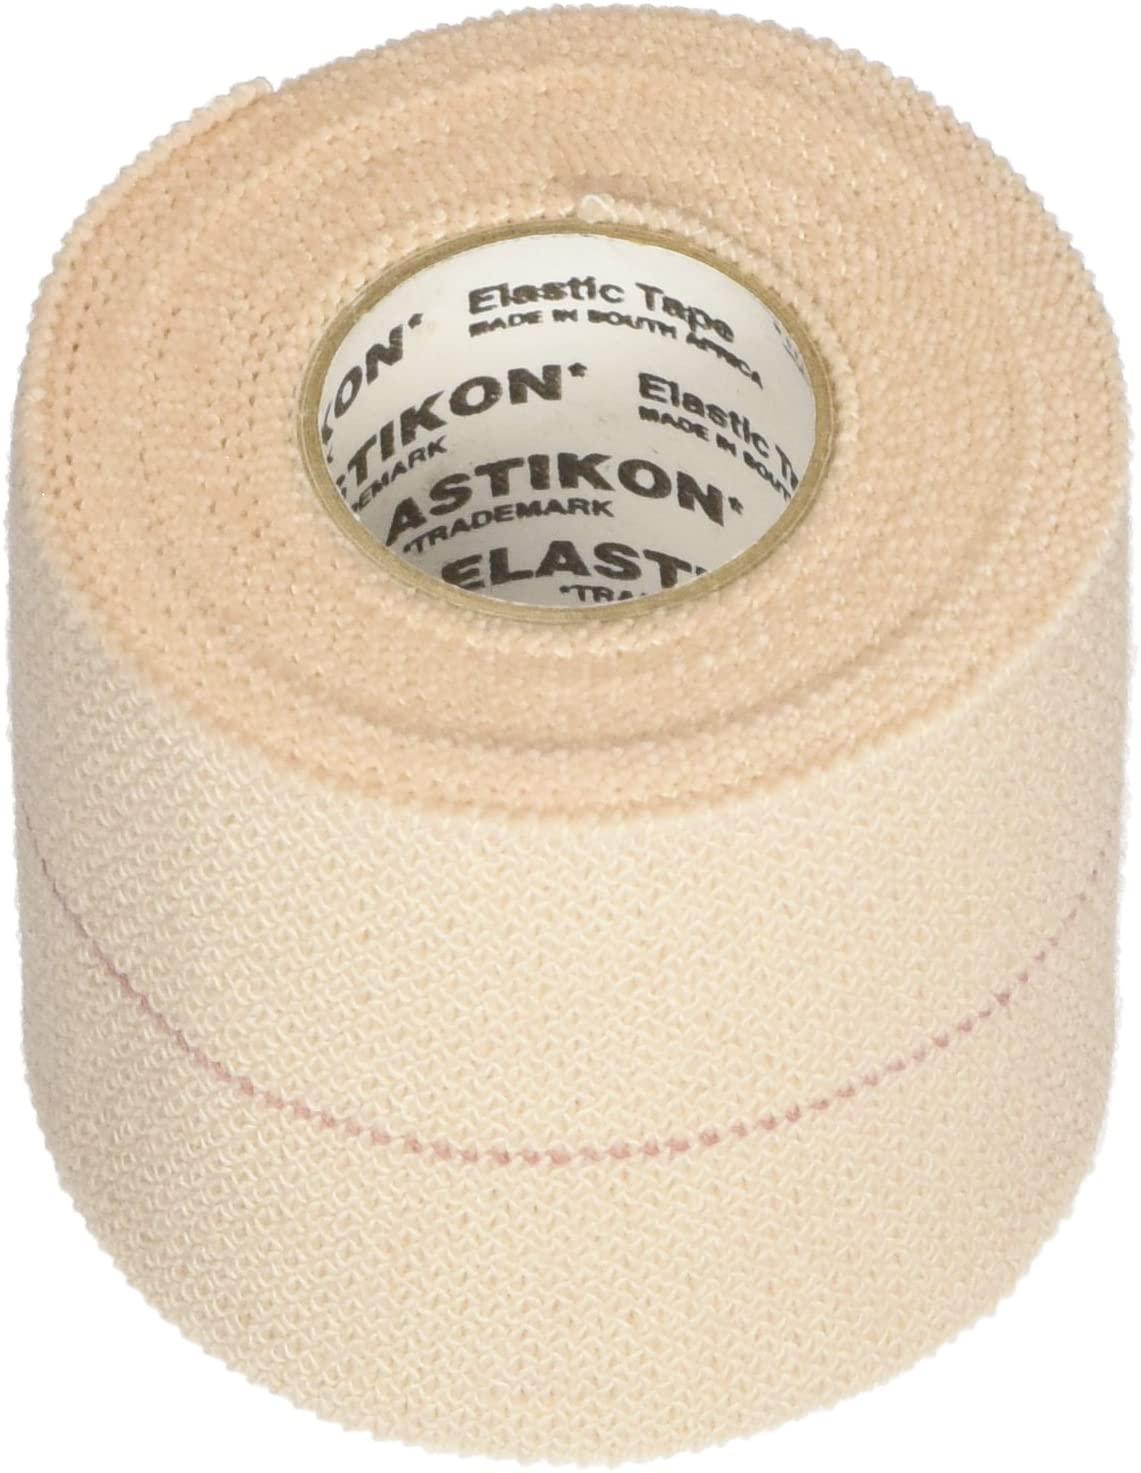 J&J HEALTHCARE First Aid Elastikon ElasticTape - 2 Inches X 2.5 yards - 6 rolls